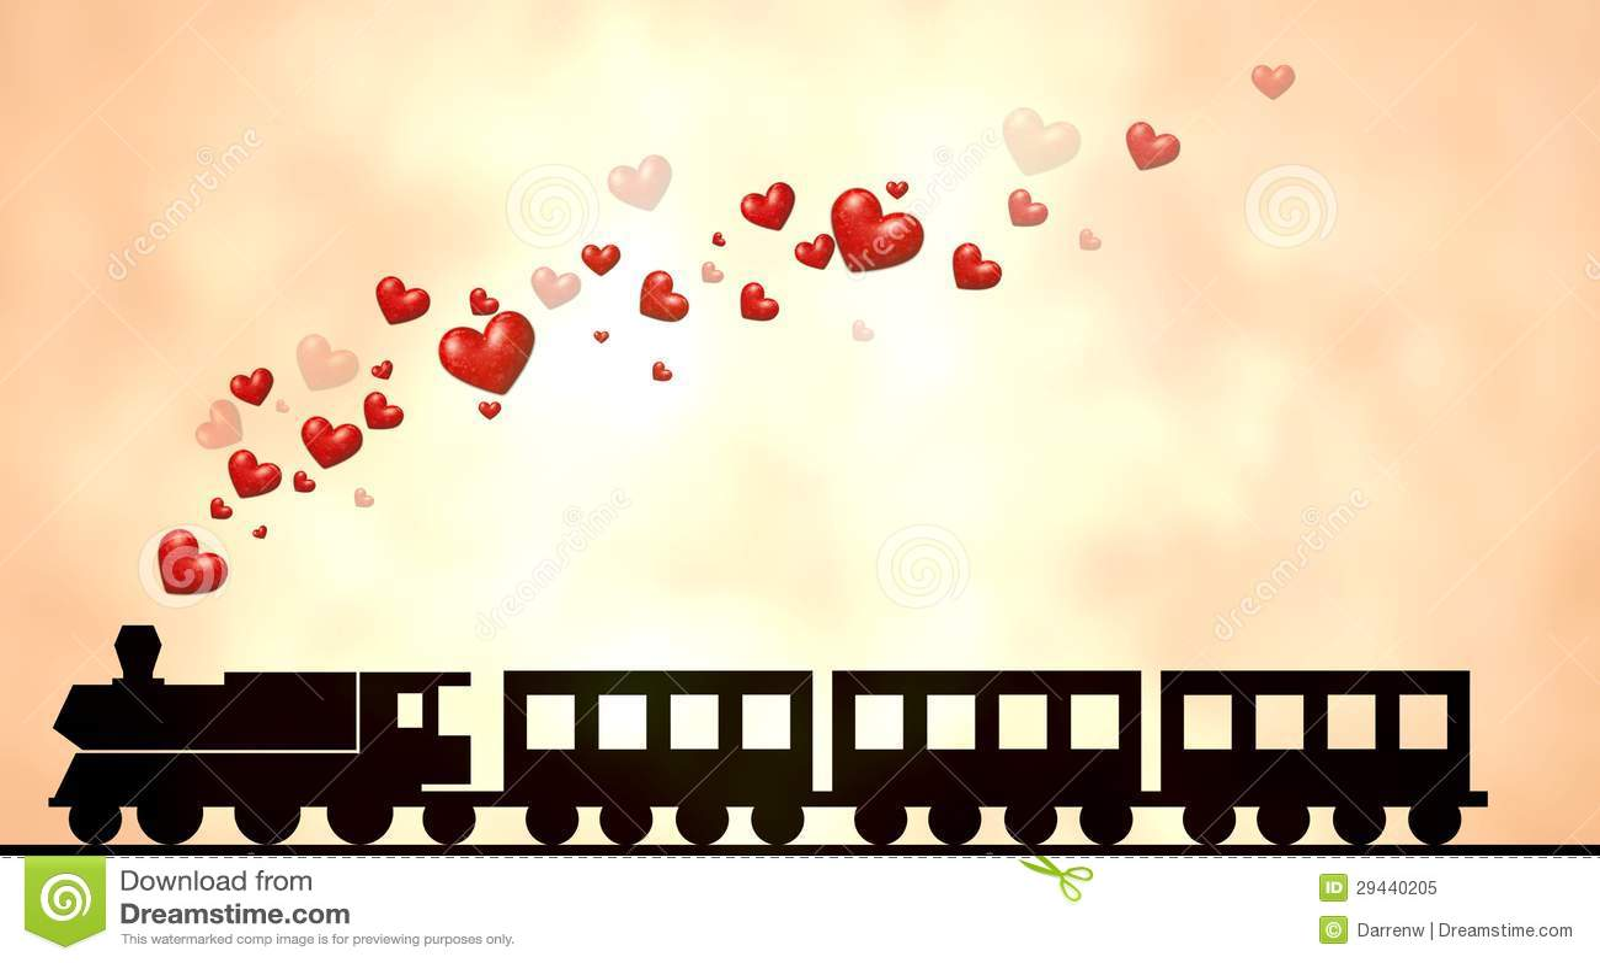 Love Train Royalty Free Stock Photo Image 29440205